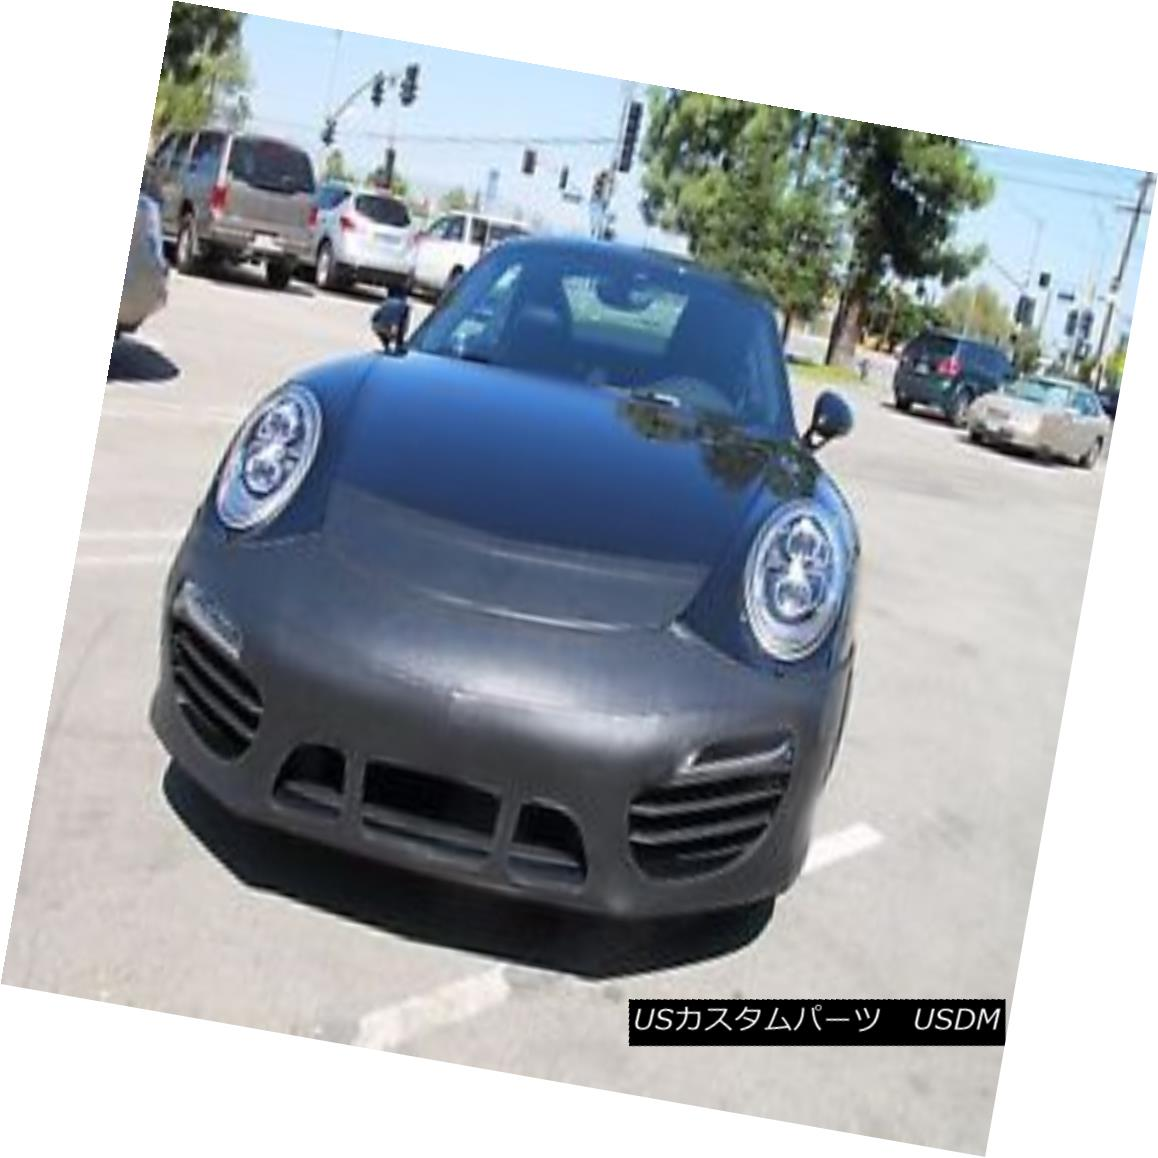 W 911 End S& 14-15 Porsche S&Cabriolet 14-15 コルガンフロントエンドマスクブラ2pc フルブラ Colgan Turbo Tag Front Bra Mask 911 ノーズブラ / Porsche Turbo Fits 2pc. W/O Cabriolet Oタグに適合